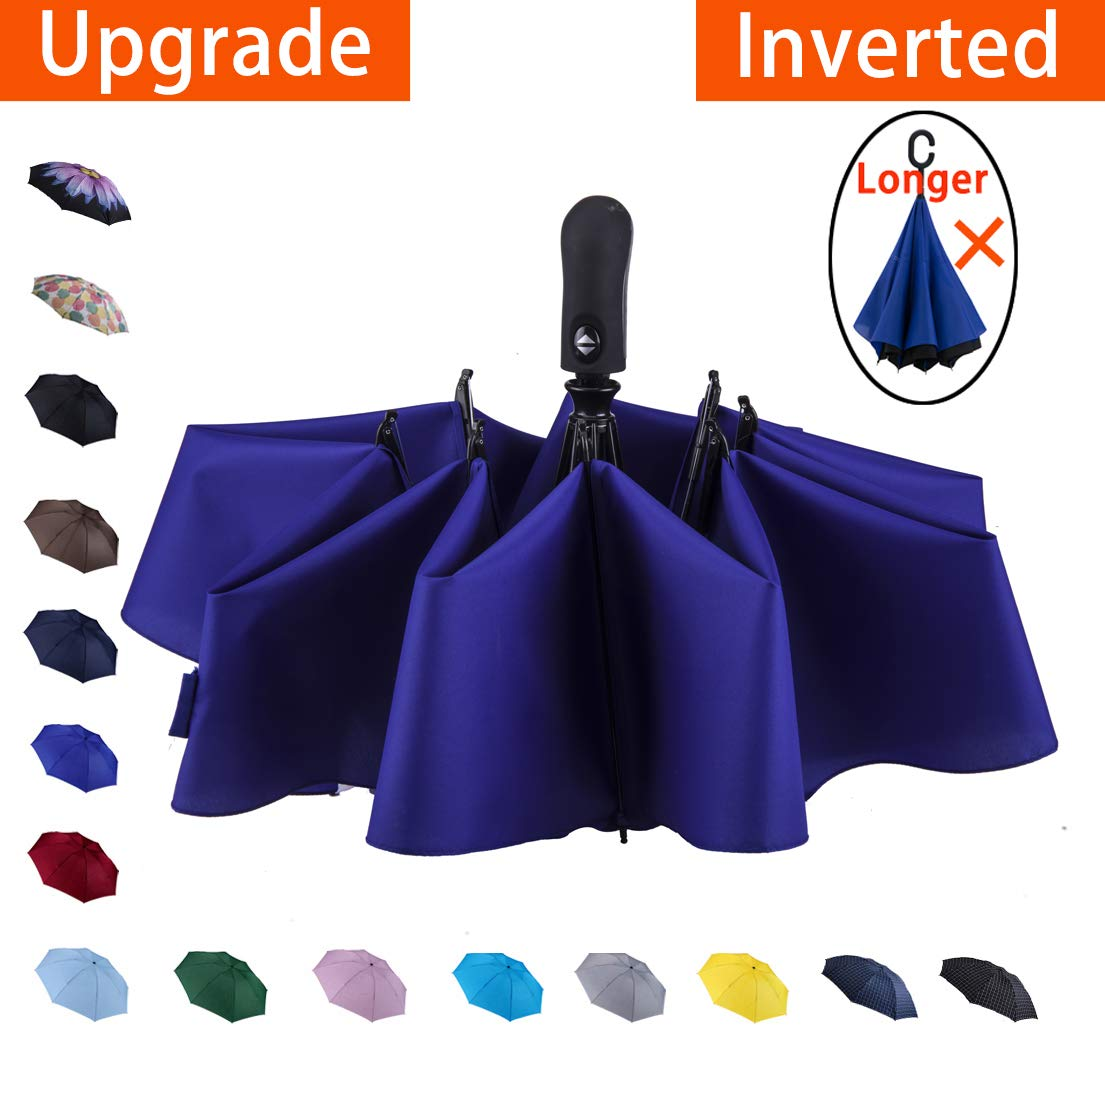 NOOFORMER Automatic Inverted Folding Umbrella - Compact Lightweight Windproof Travel Reverse Car Umbrellas for Men Women Multiple Colors